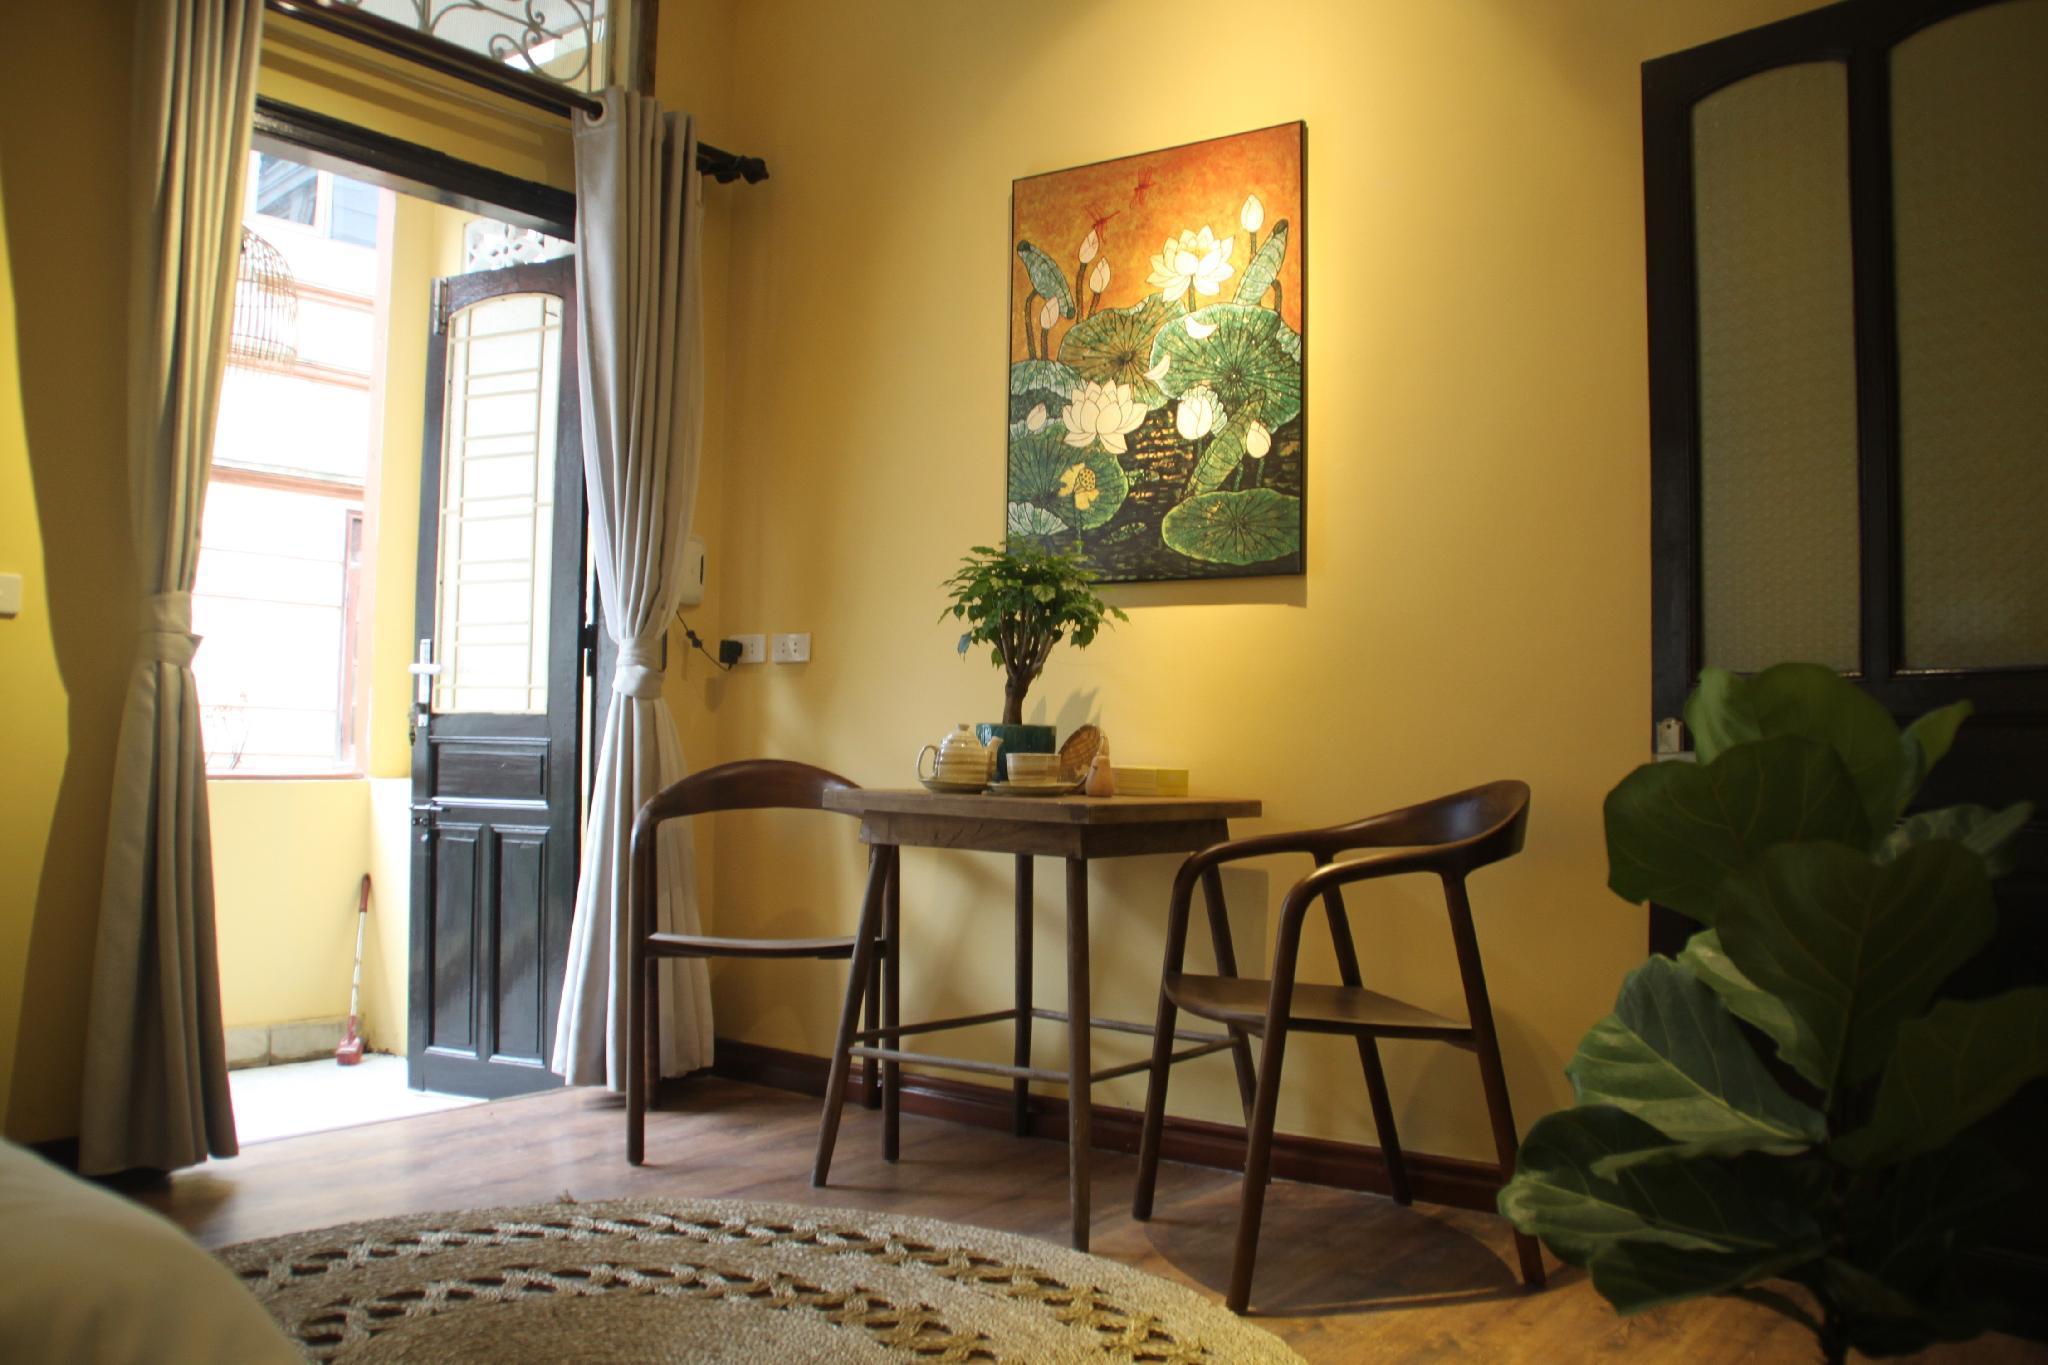 Ellogia Ananas by Hostesk,quiet streetview balcony